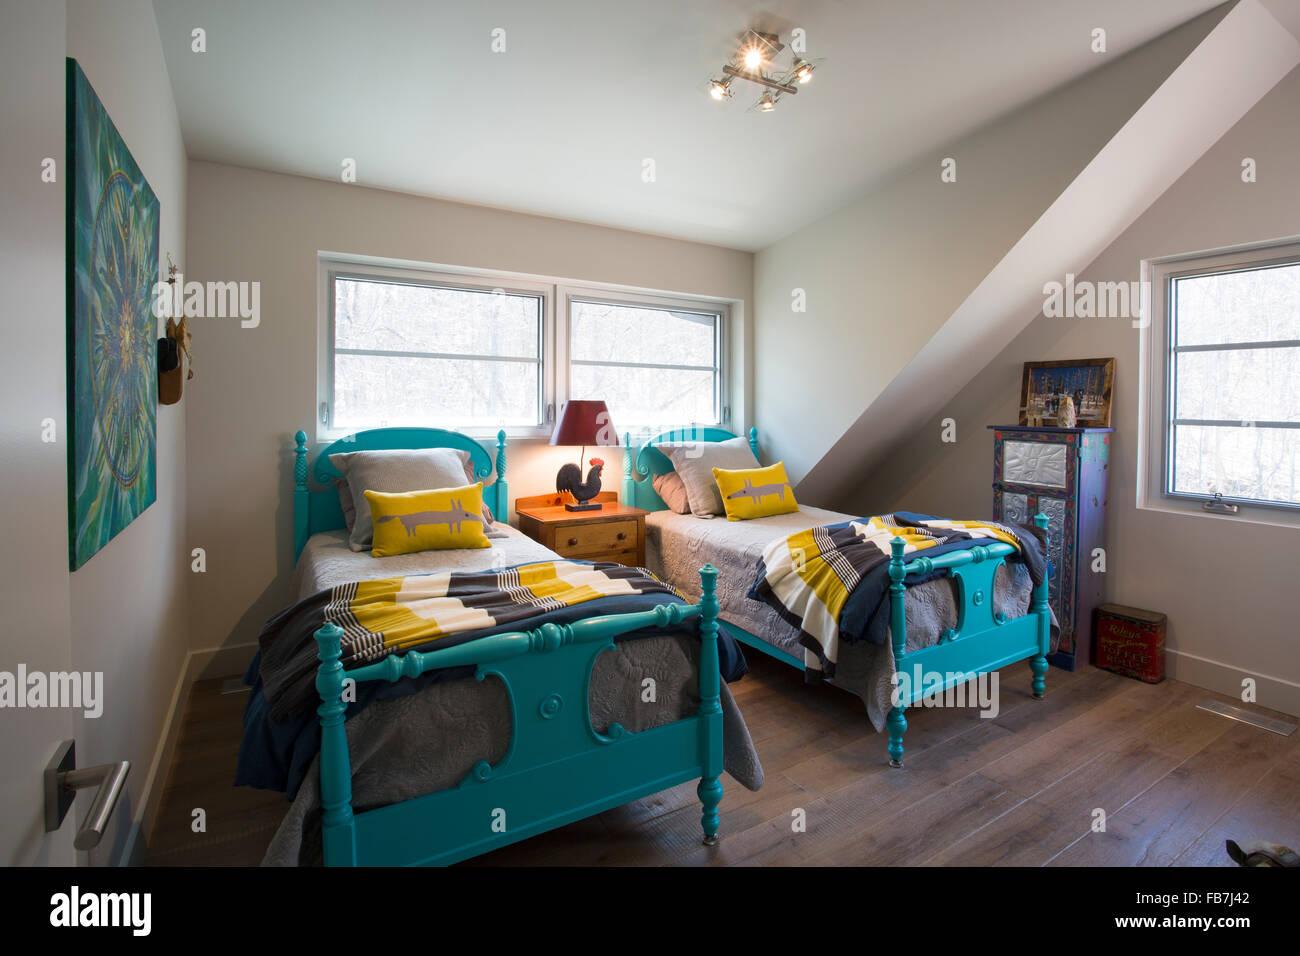 Dormitorio con dos camas. Imagen De Stock